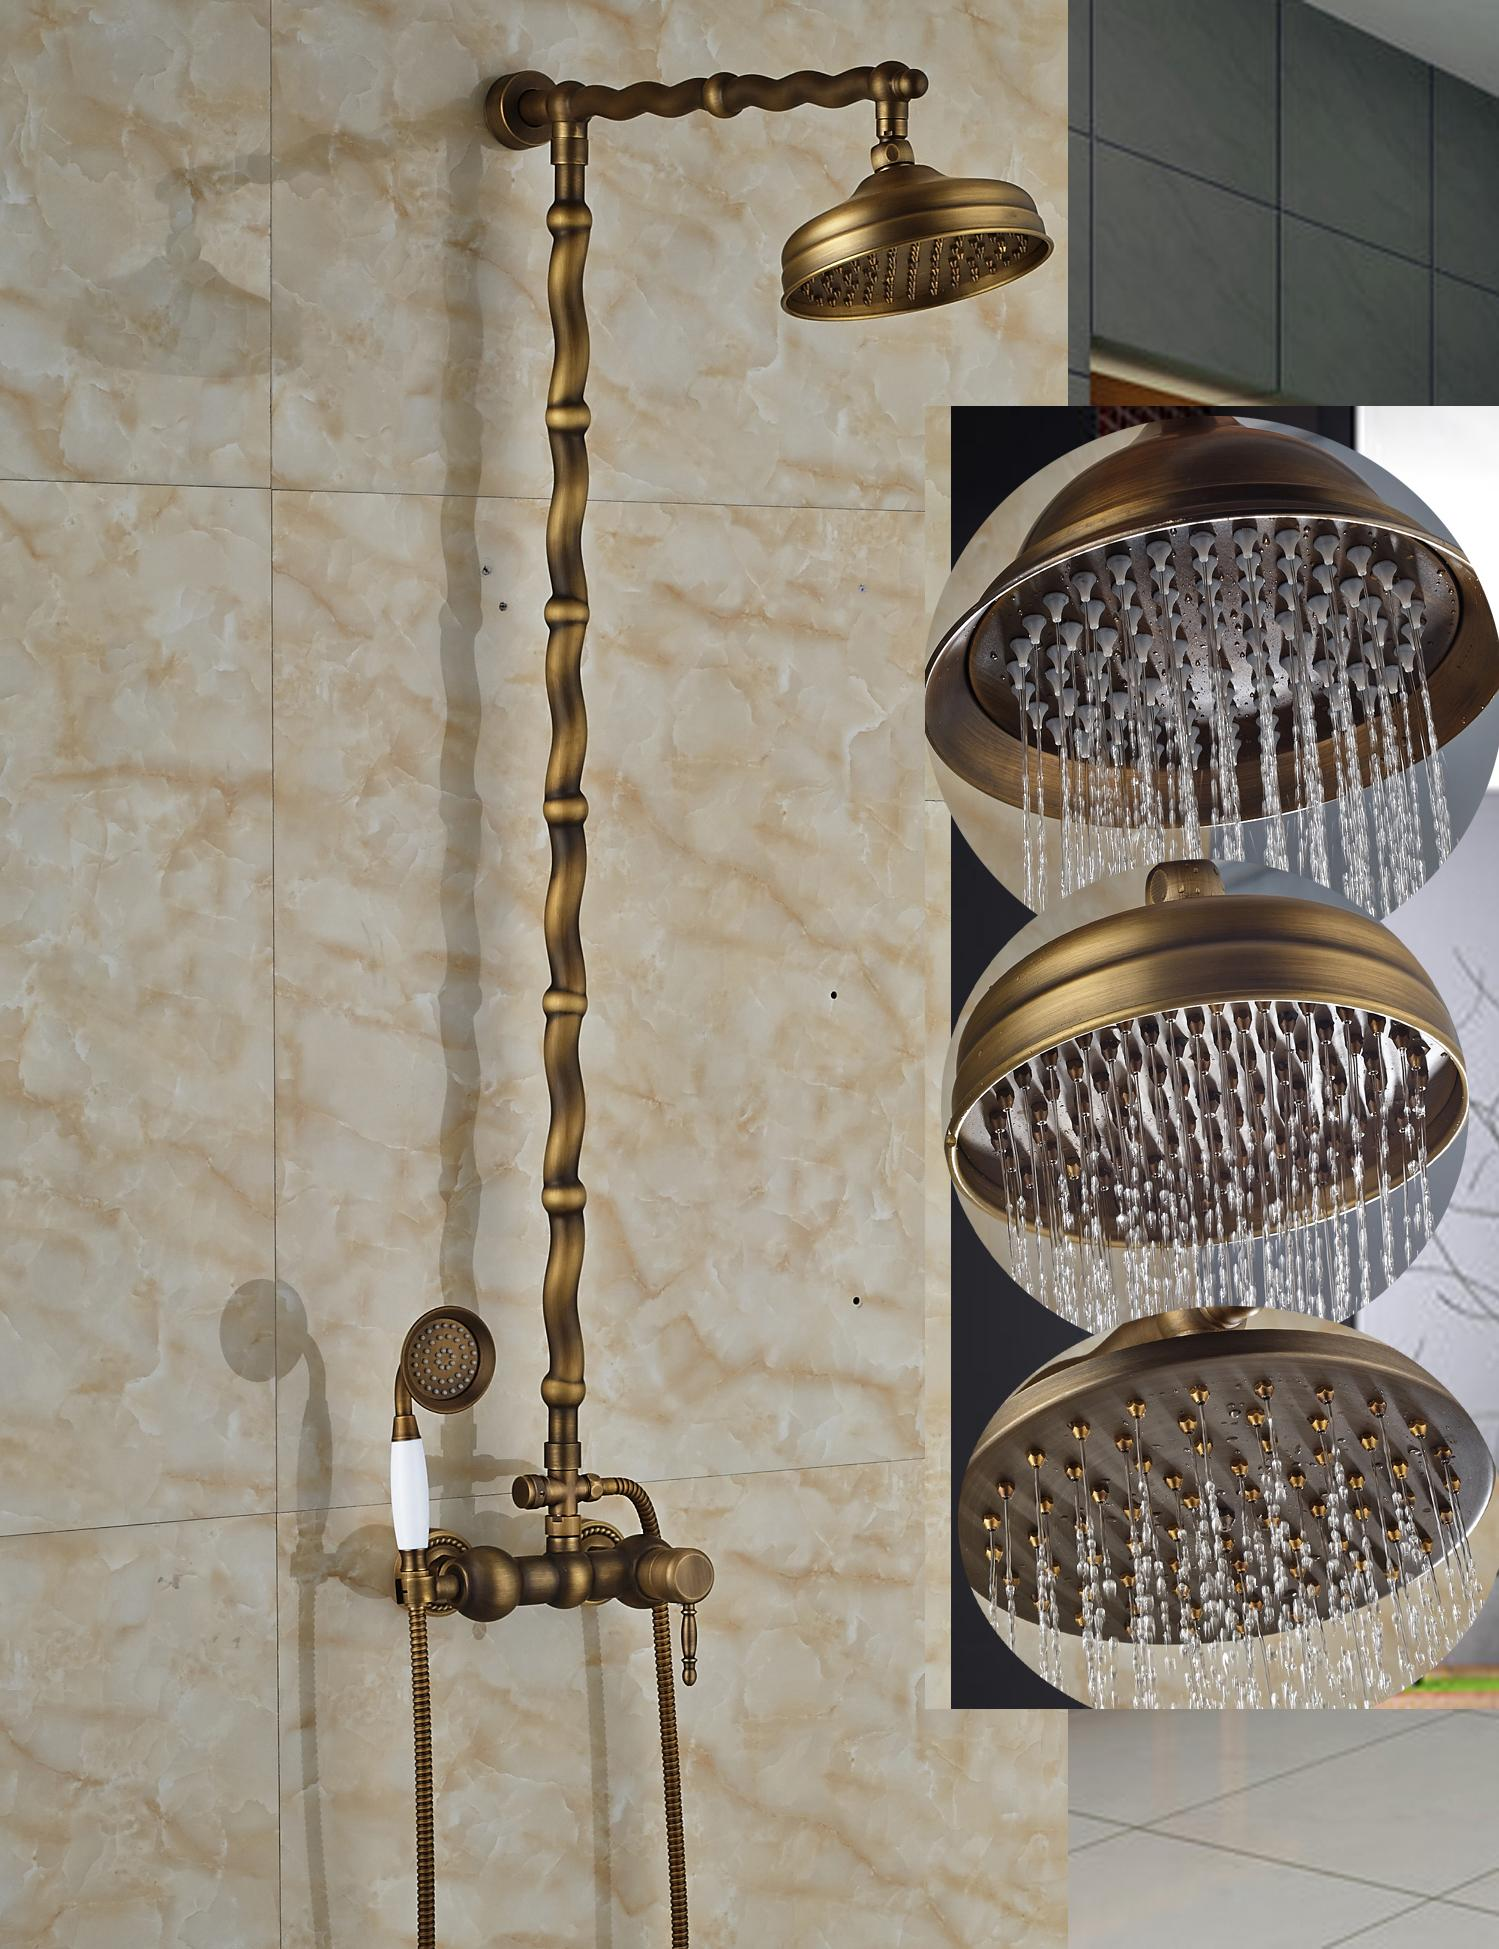 2019 Luxury Antique Brass Round Rain Shower Faucet Set Classic Bars Shower Mixer Tap Ceramic Hand Shower Sprayer From Gonglangno1 208 05